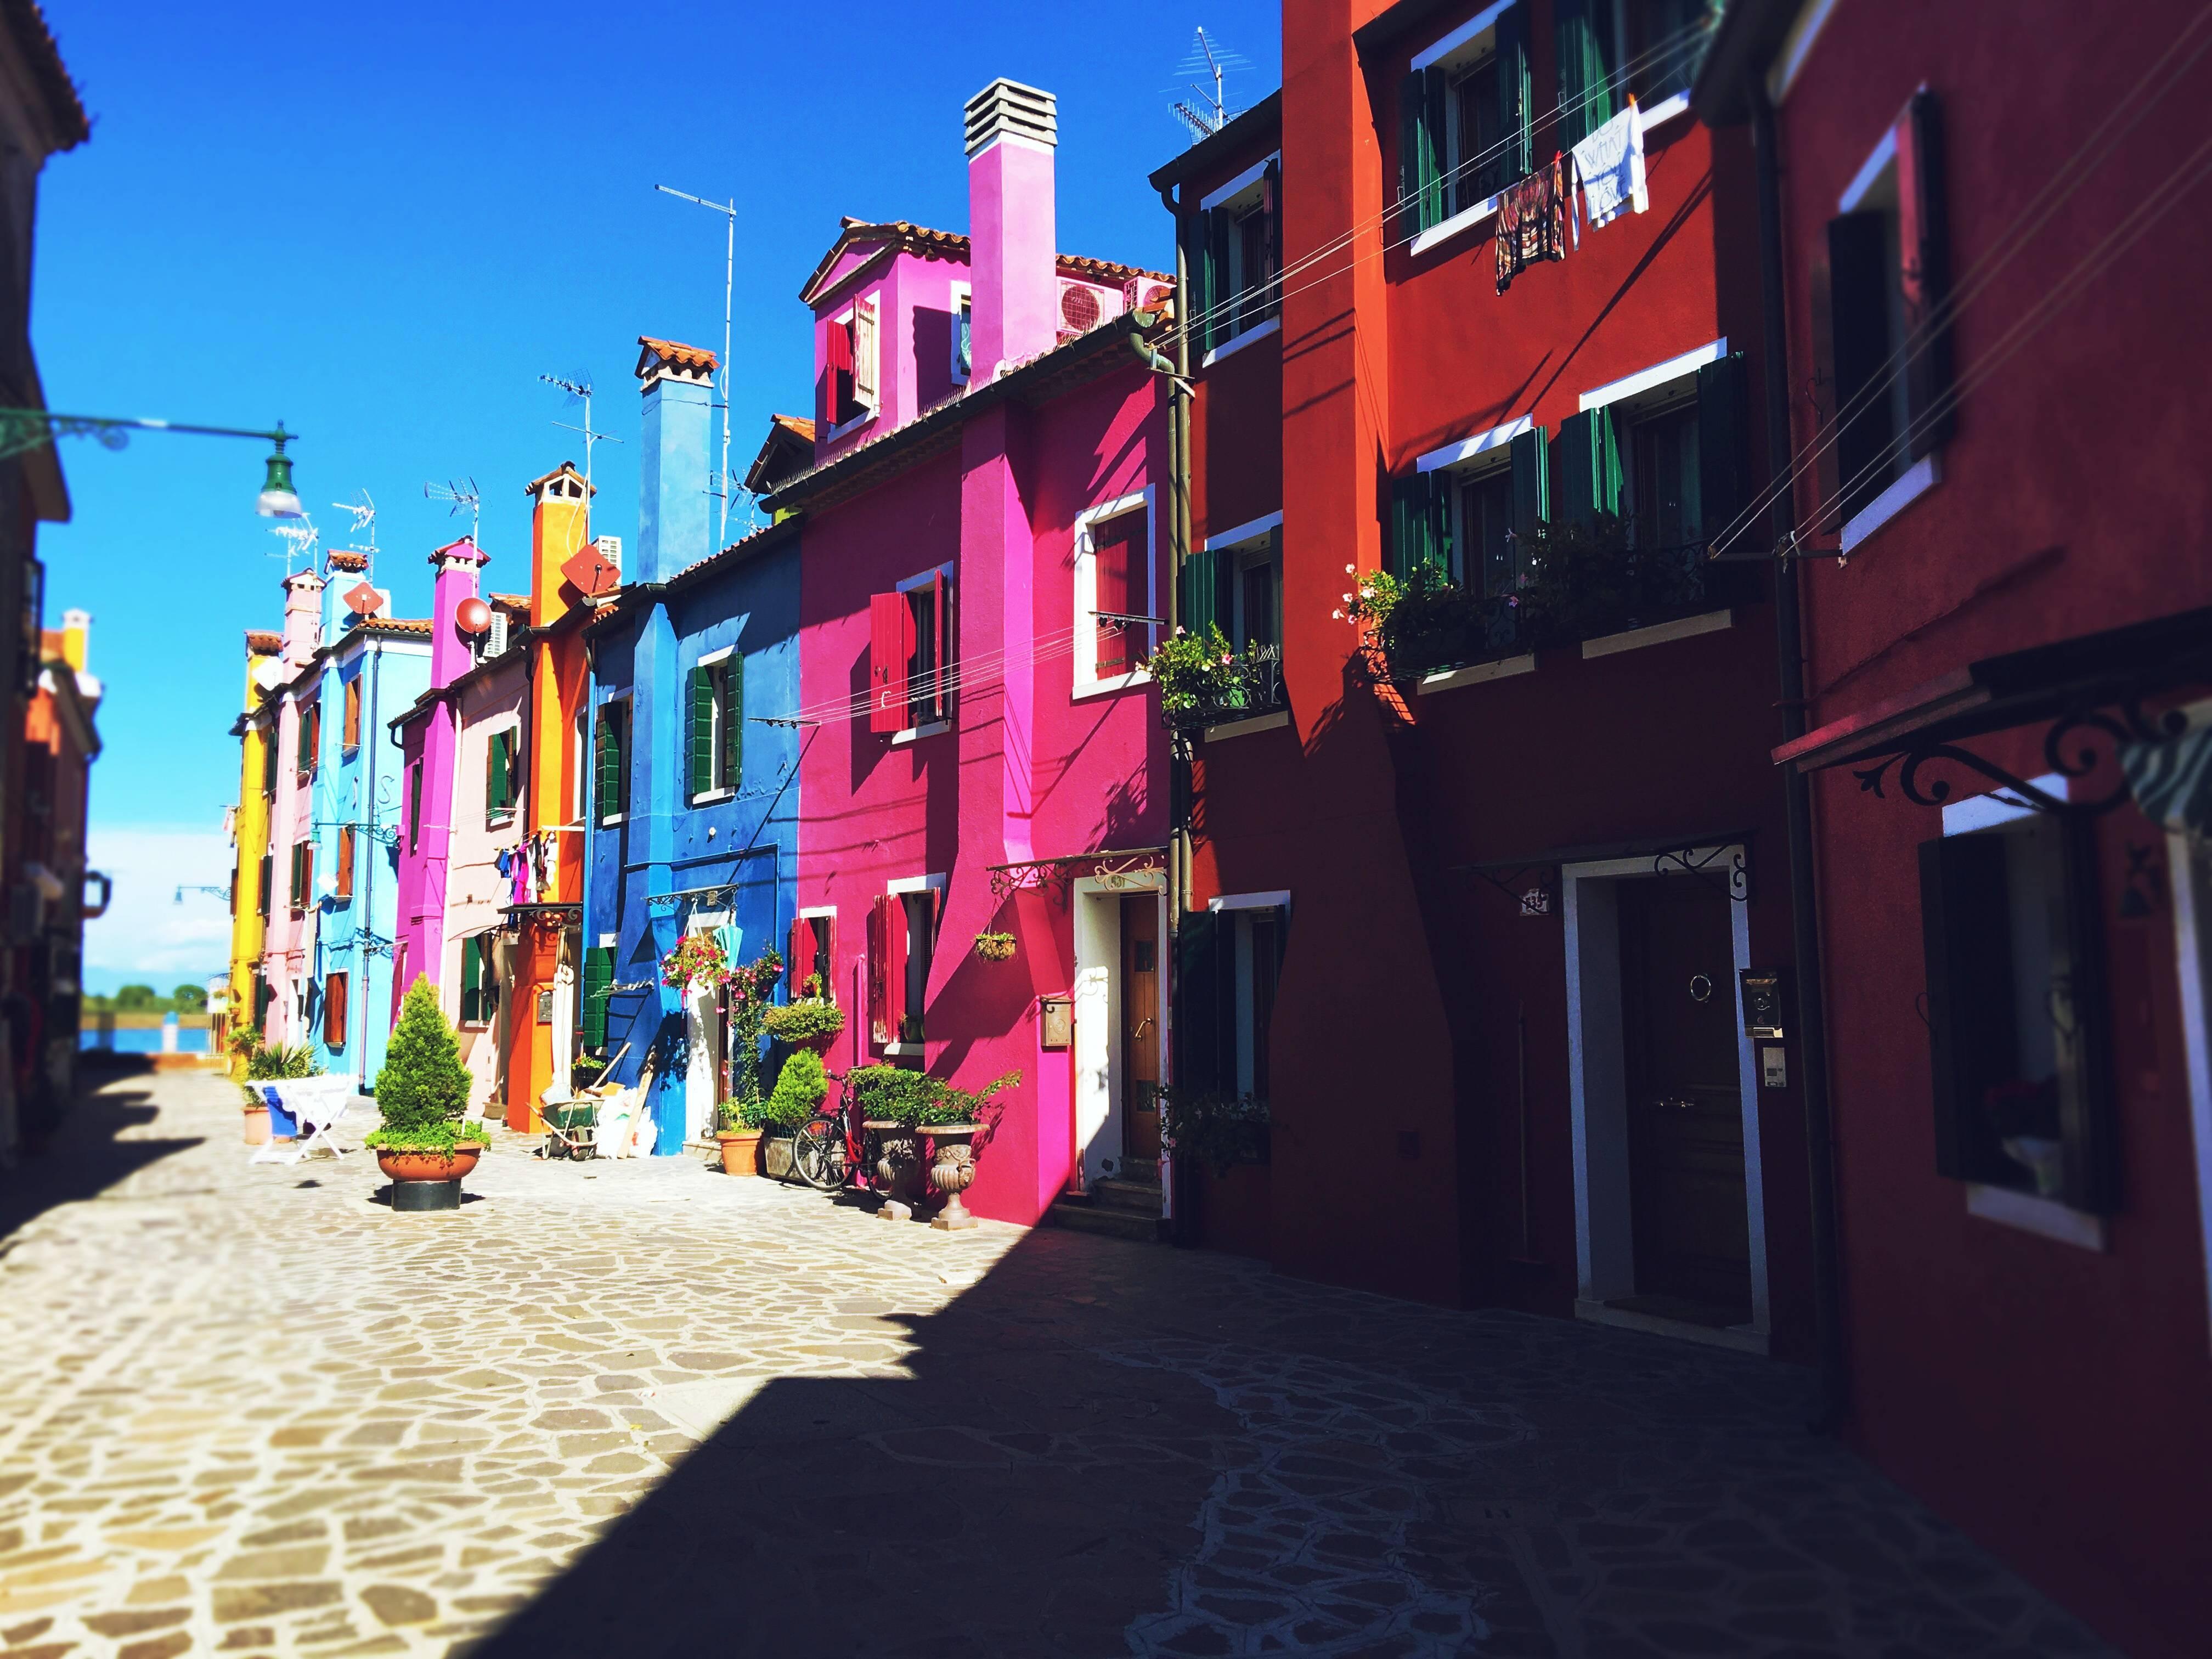 Photo 2: Burano - Un endroit incroyablement joli